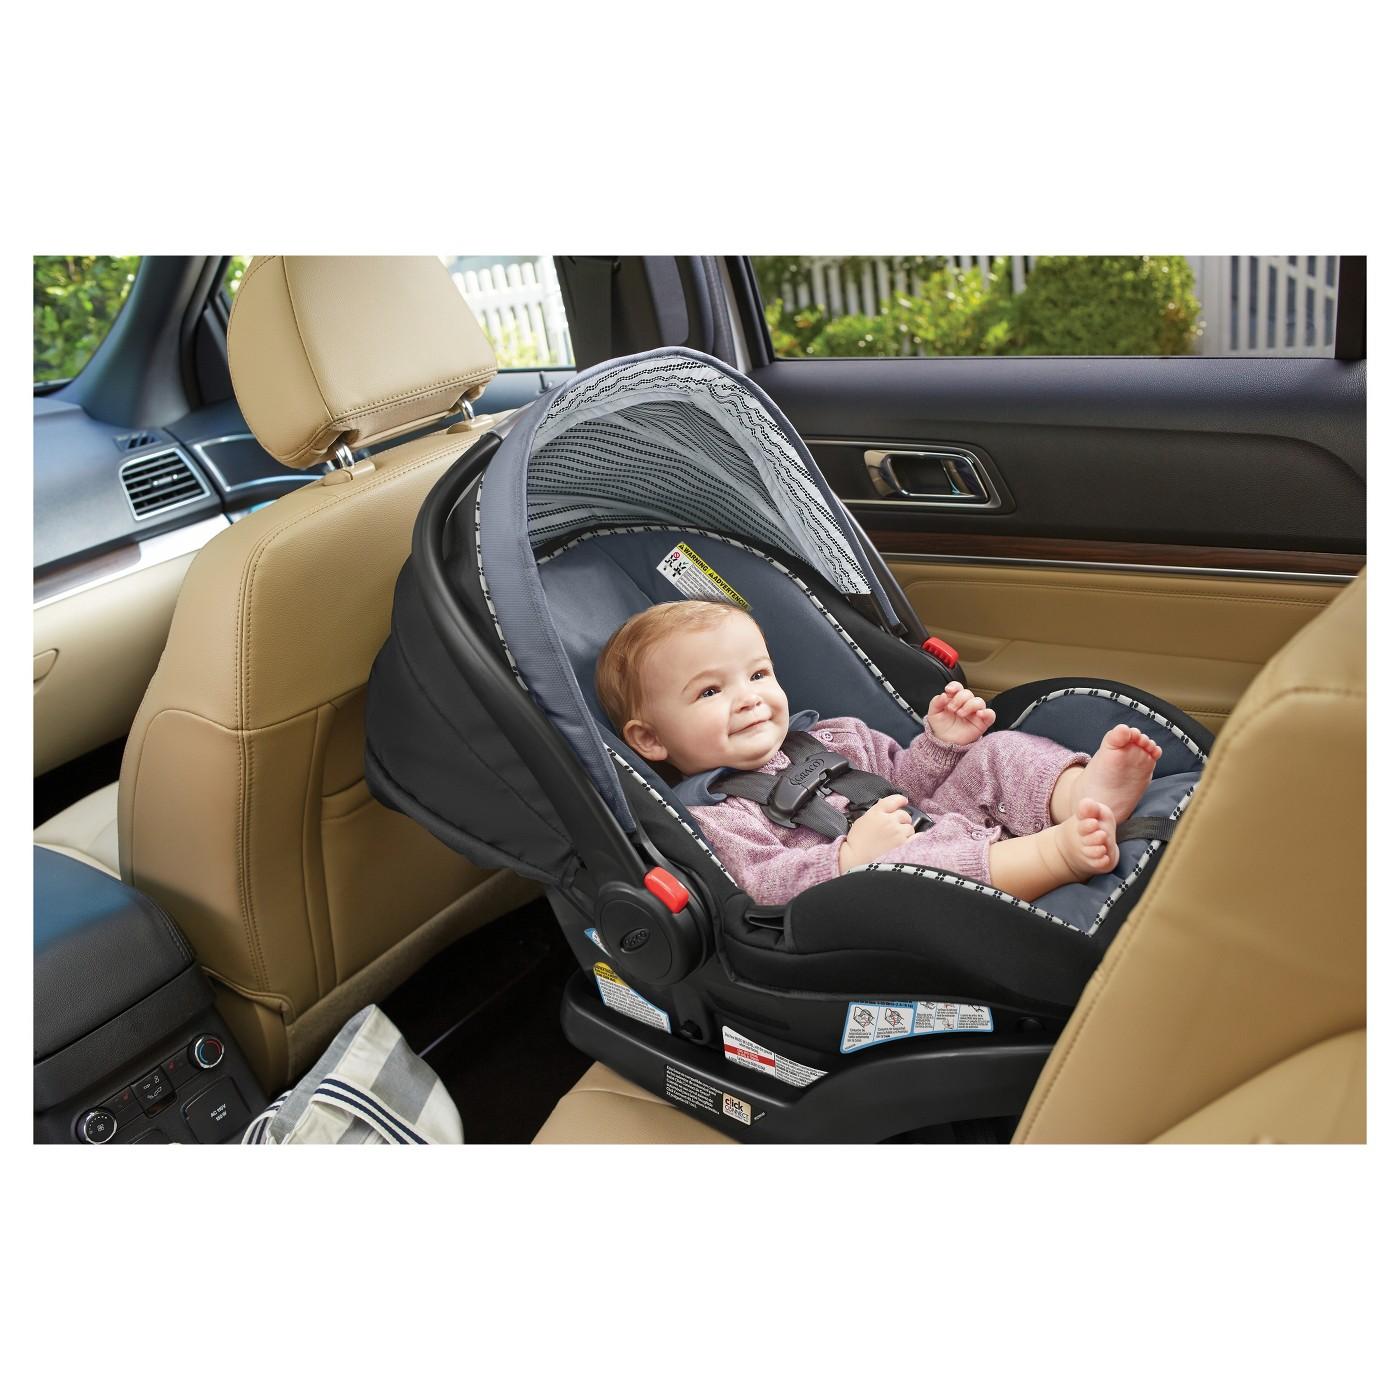 Graco® SnugRide SnugLock 35 Infant Car Seat - image 5 of 8